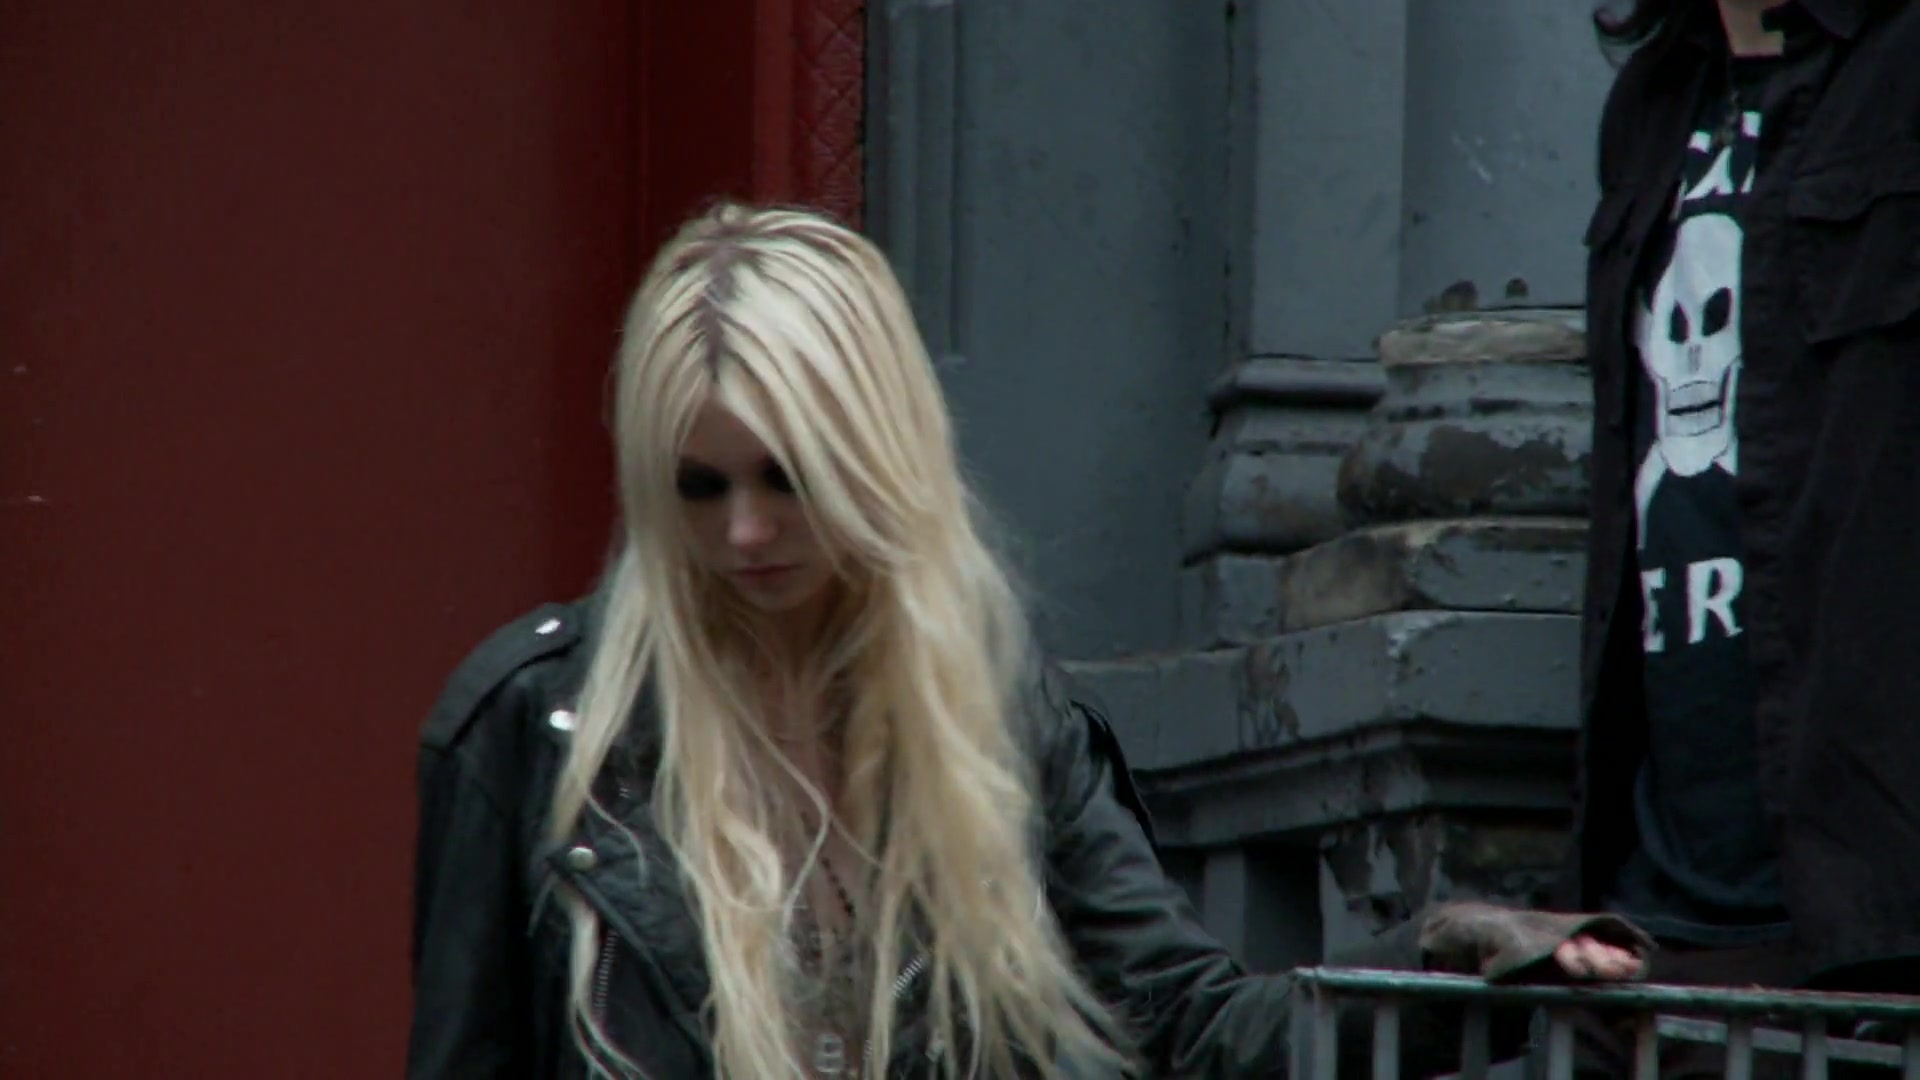 taylor-momsen-teen-vogue-photoshoot-2010-31